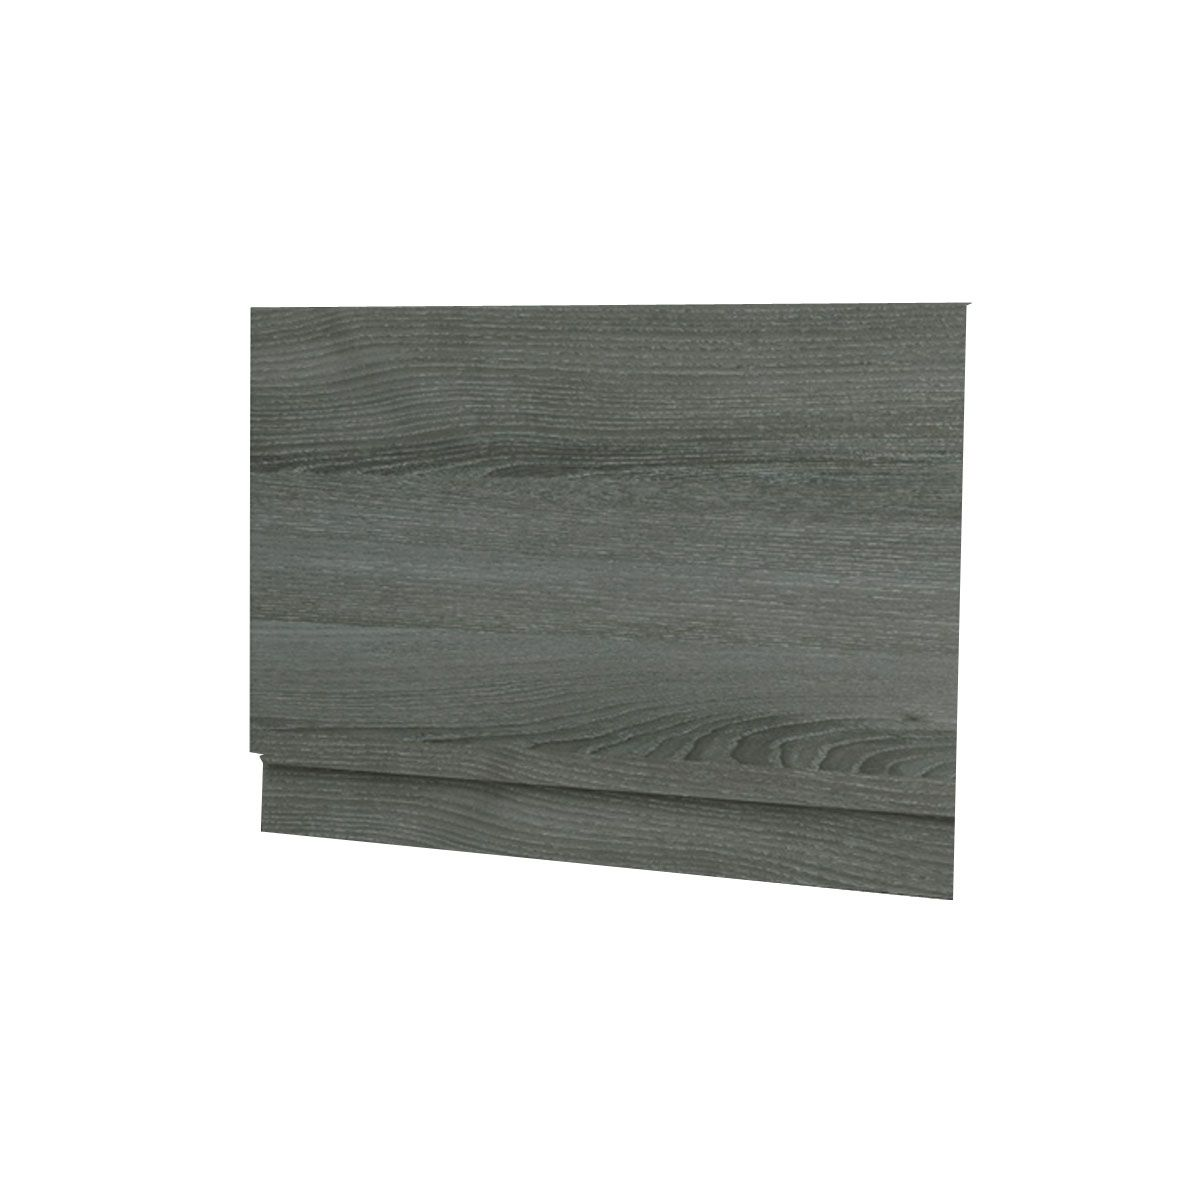 Kartell Purity Grey Ash 2 Piece Bath End Panel 700mm